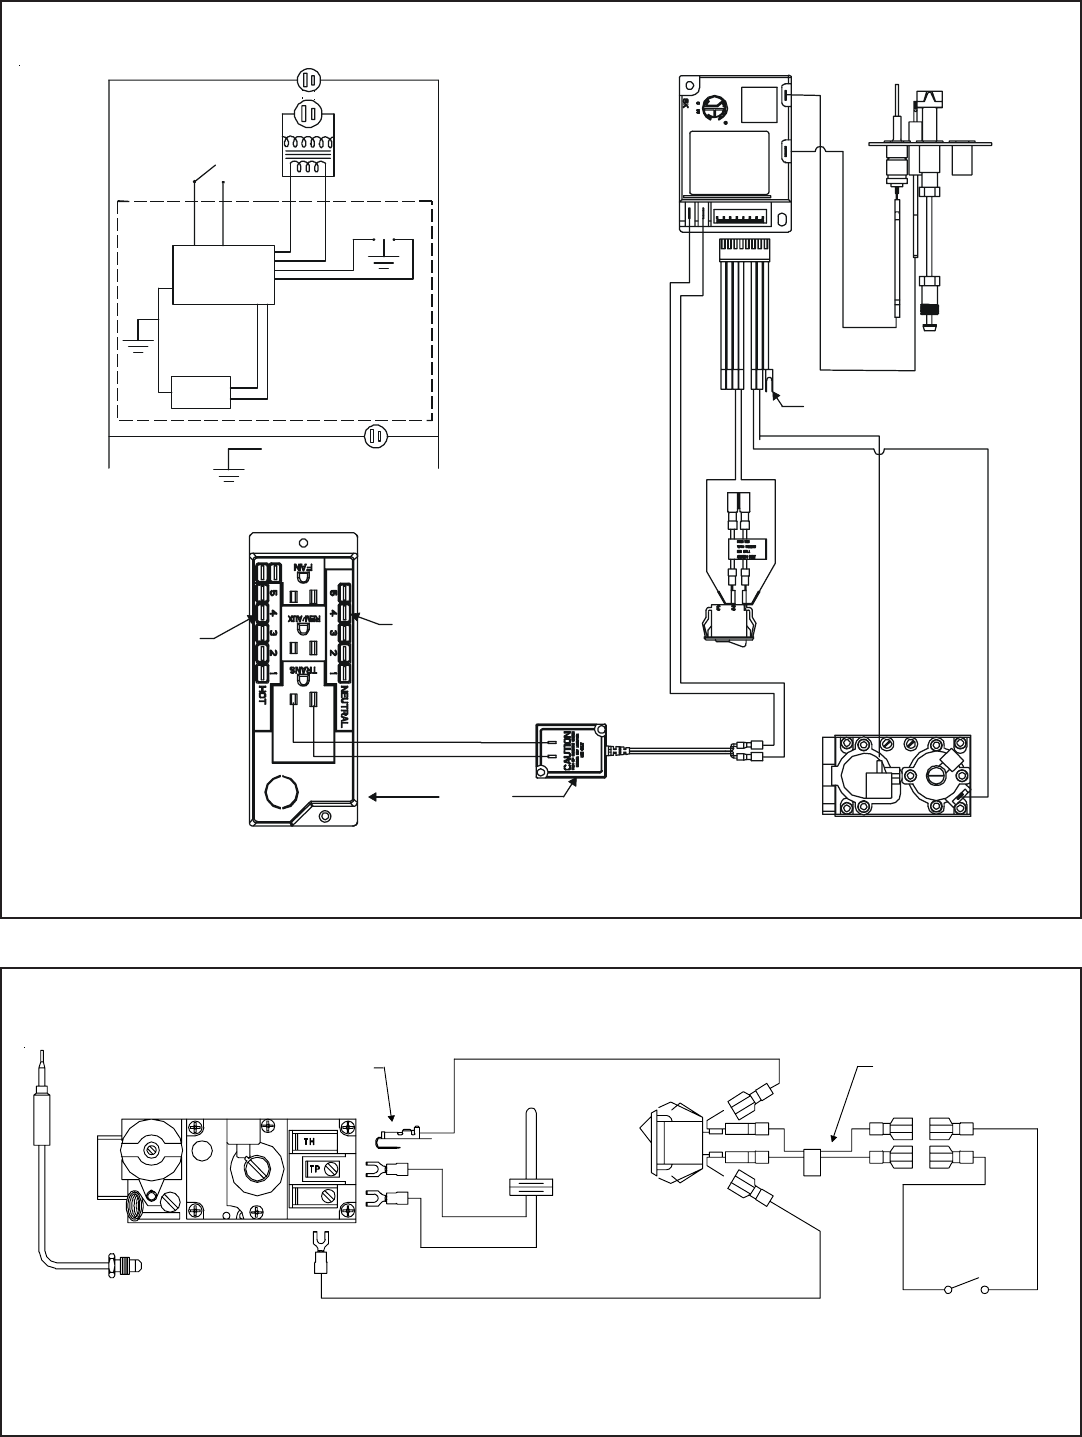 EX_4069] Glo Underfloor Heating Wiring DiagramTrua Nect Kapemie Diog Oxyt Ricis Spoat Puti Reda Syny Onica Nuvit Aspi  Rosz Gram Phae Mohammedshrine Librar Wiring 101